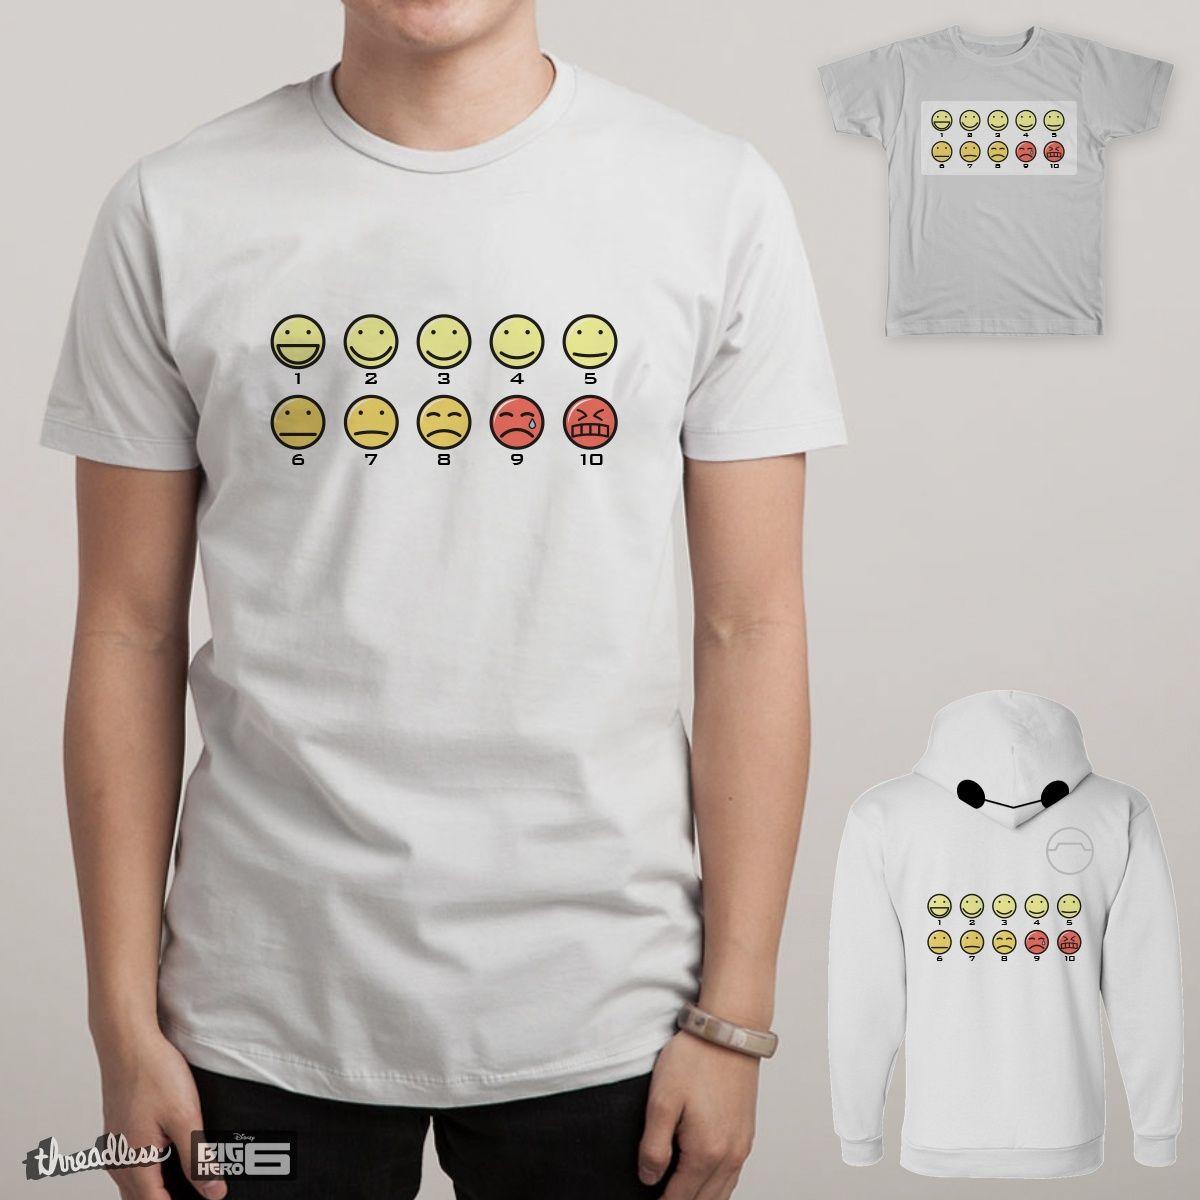 58aa542e9 Now for sale Big Hero 6, Baymax, T-shirt, Design, Disney, Marvel WANT